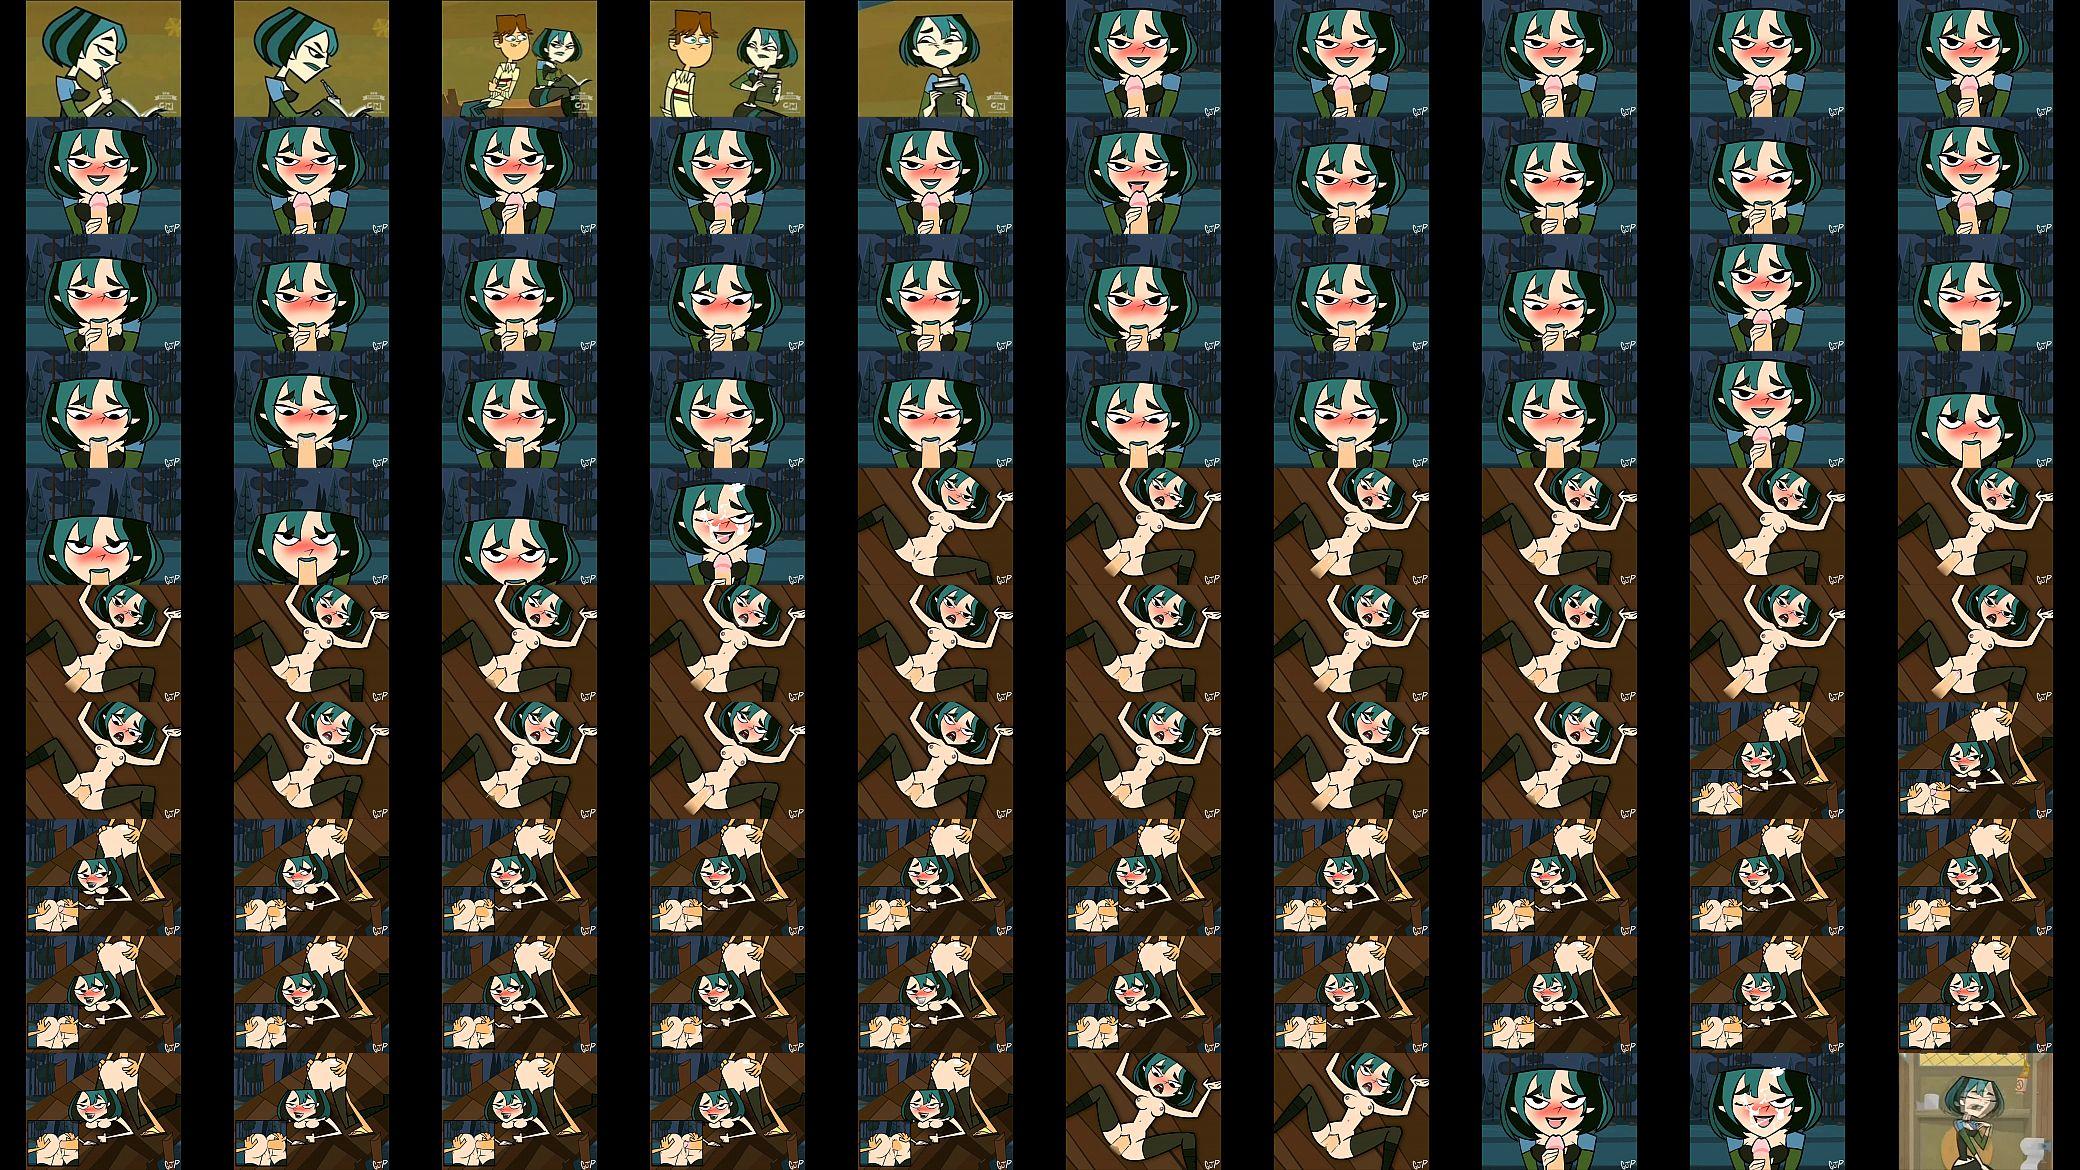 Gwen sex game total drama island total drama island hentai